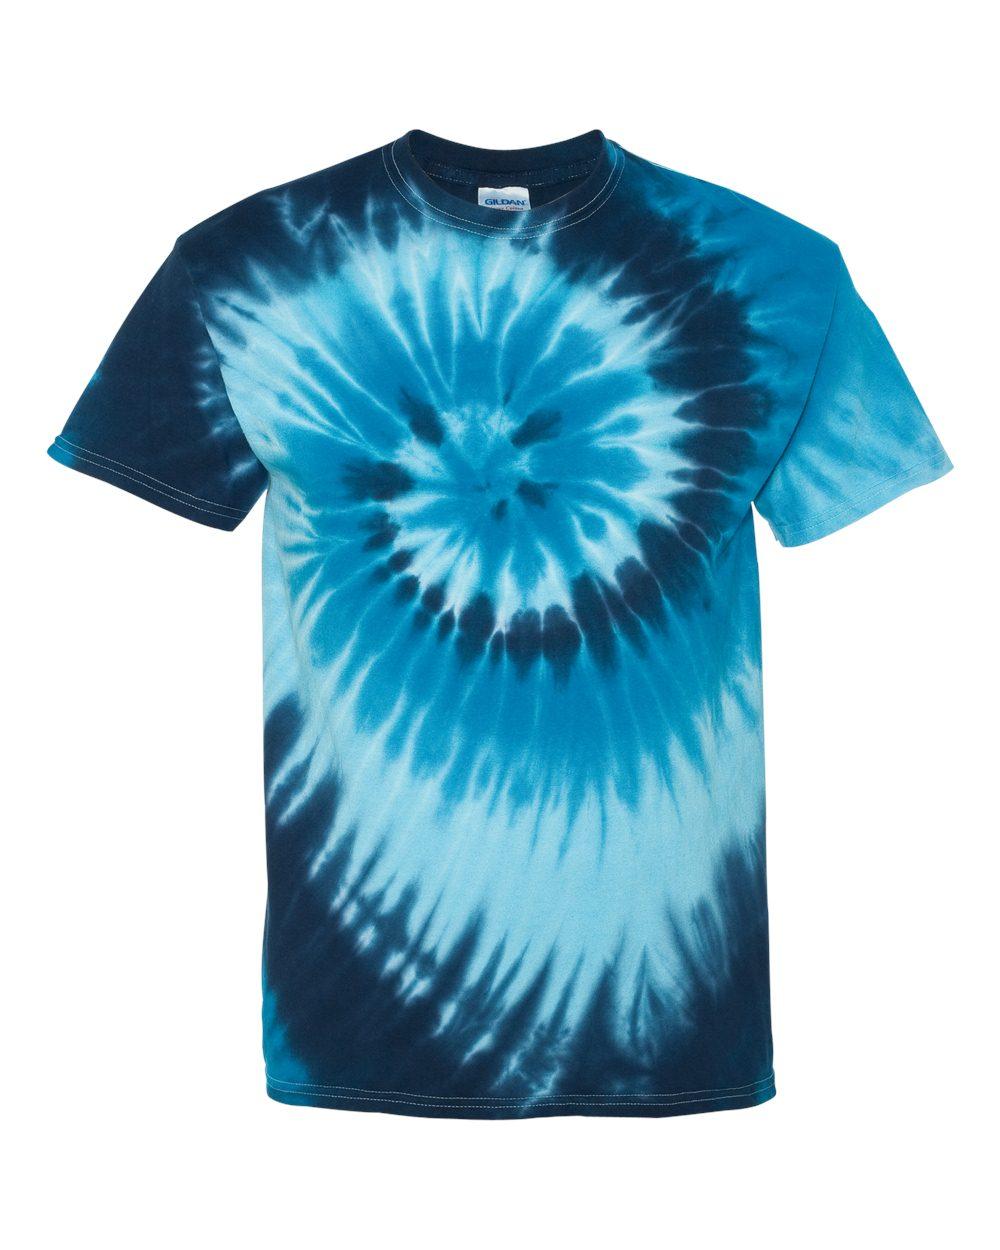 Tide Short Sleeve T-Shirt